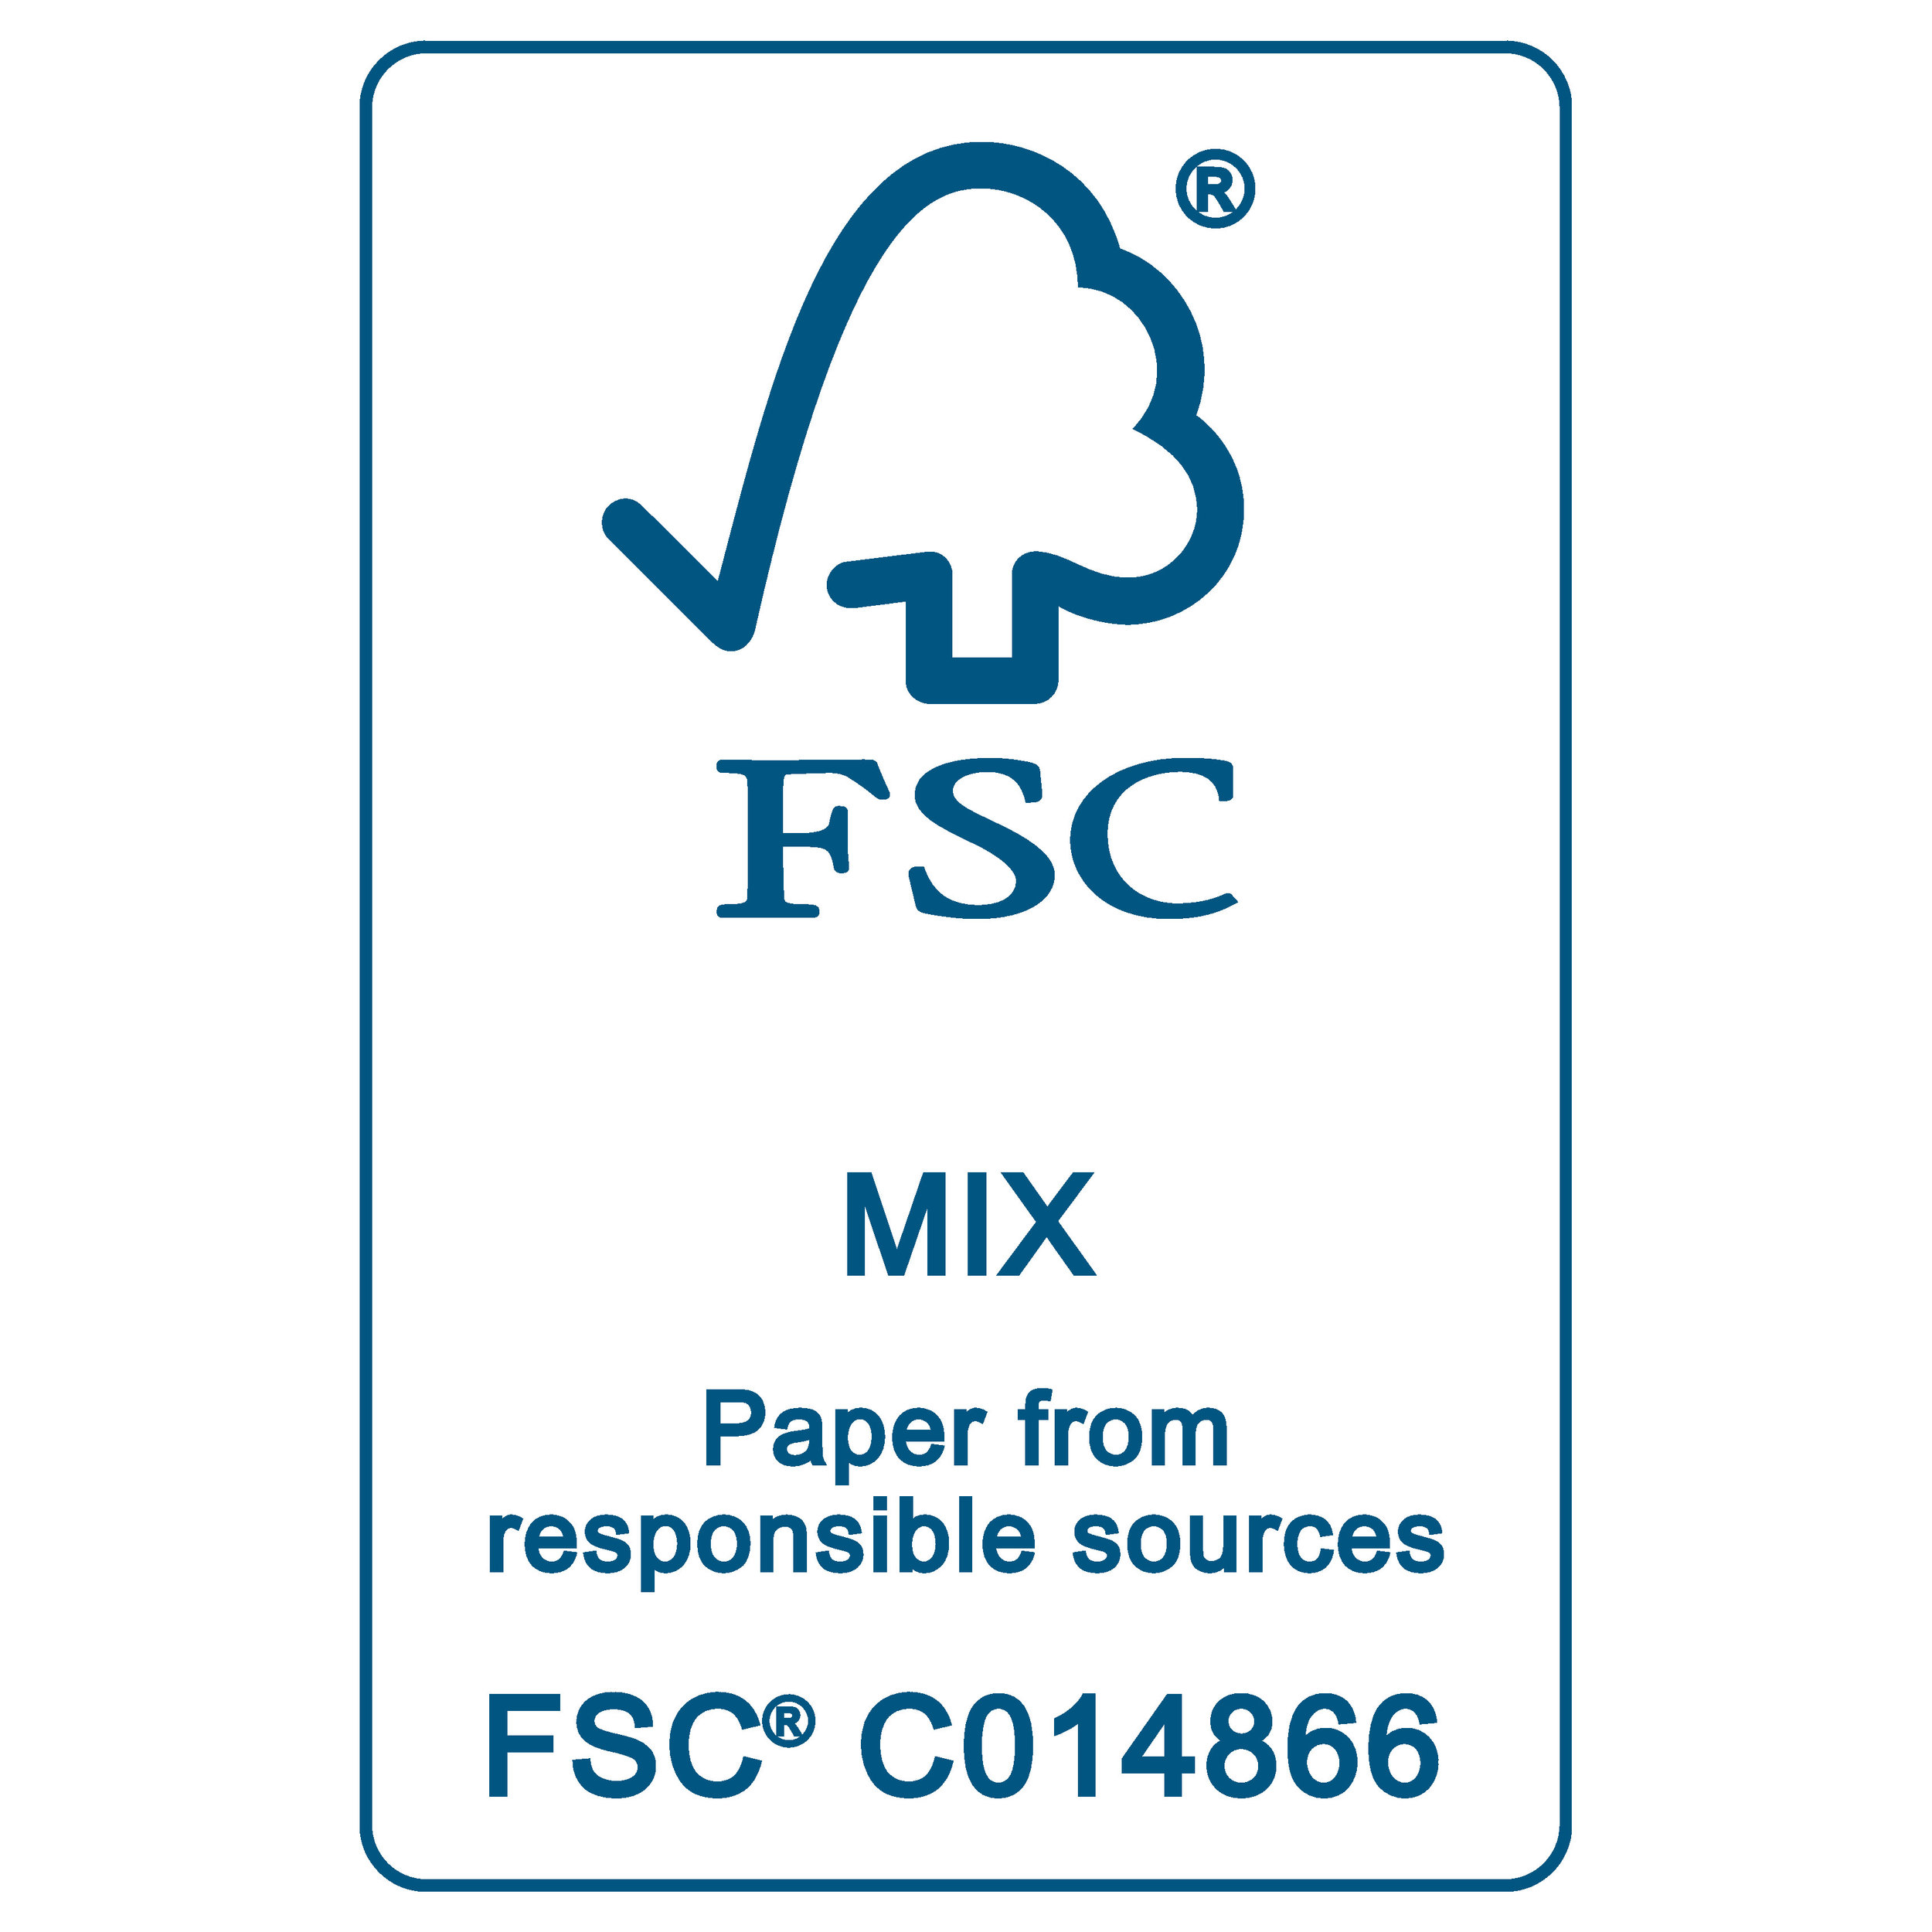 fsc-logo-large-mod.jpg